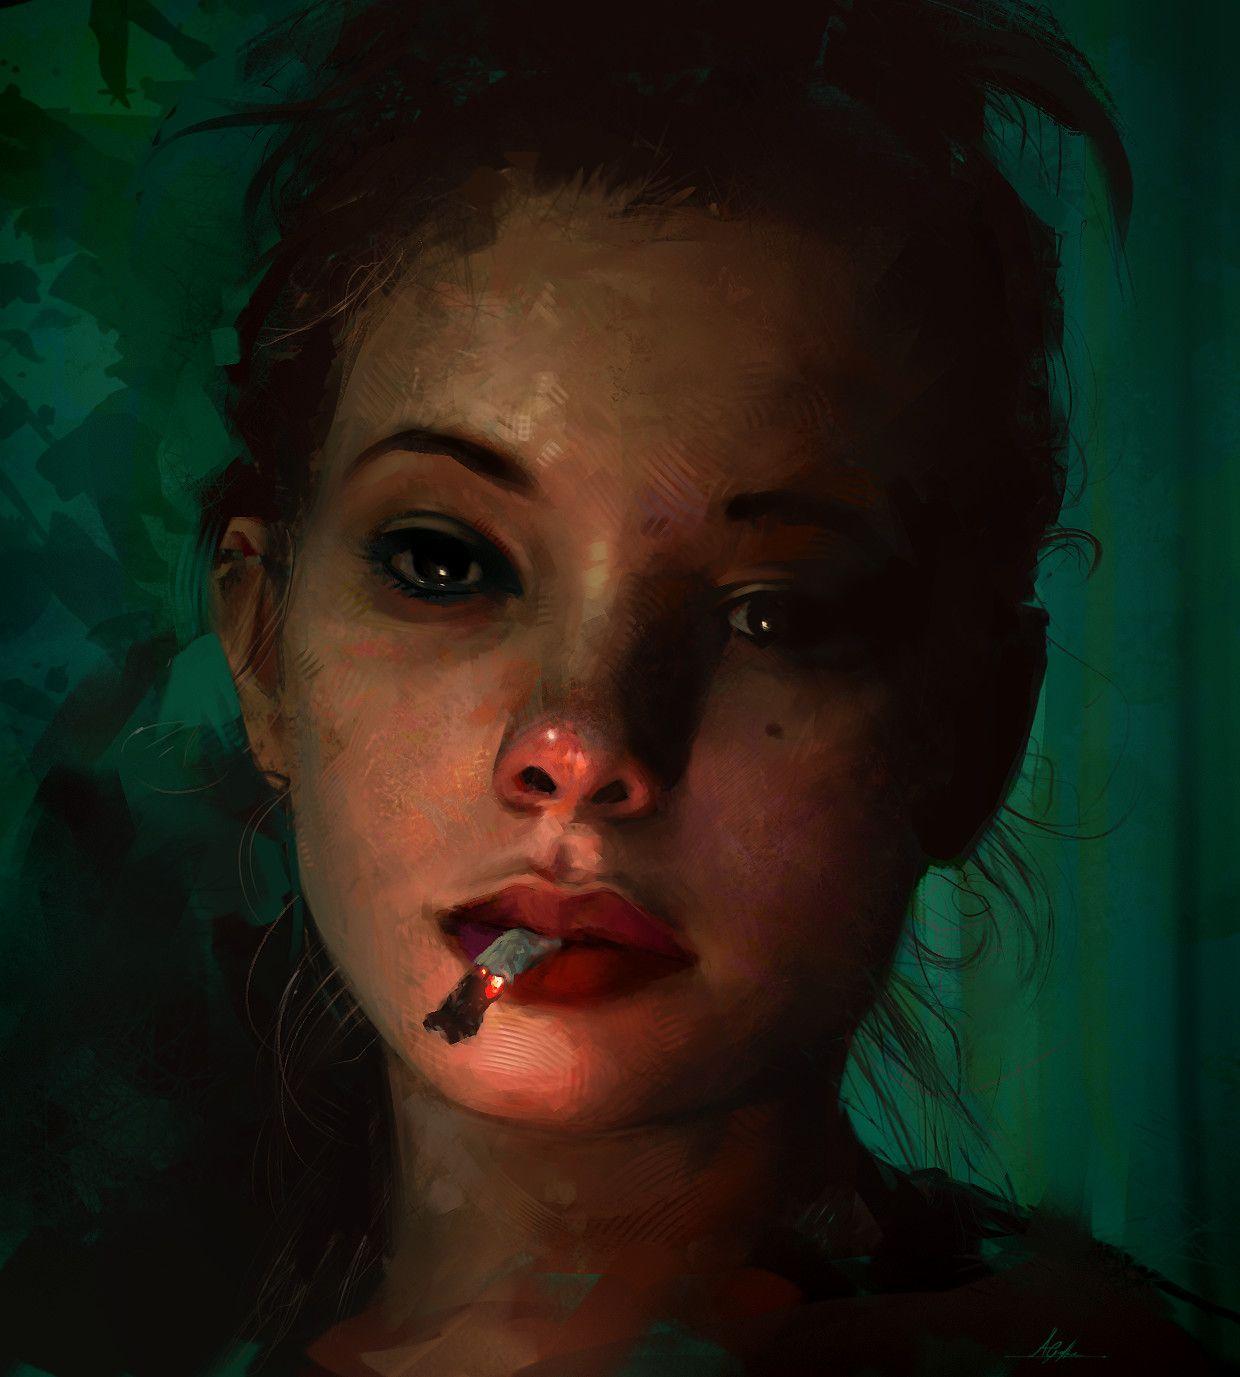 ArtStation - Cigarette, Aaron Griffin